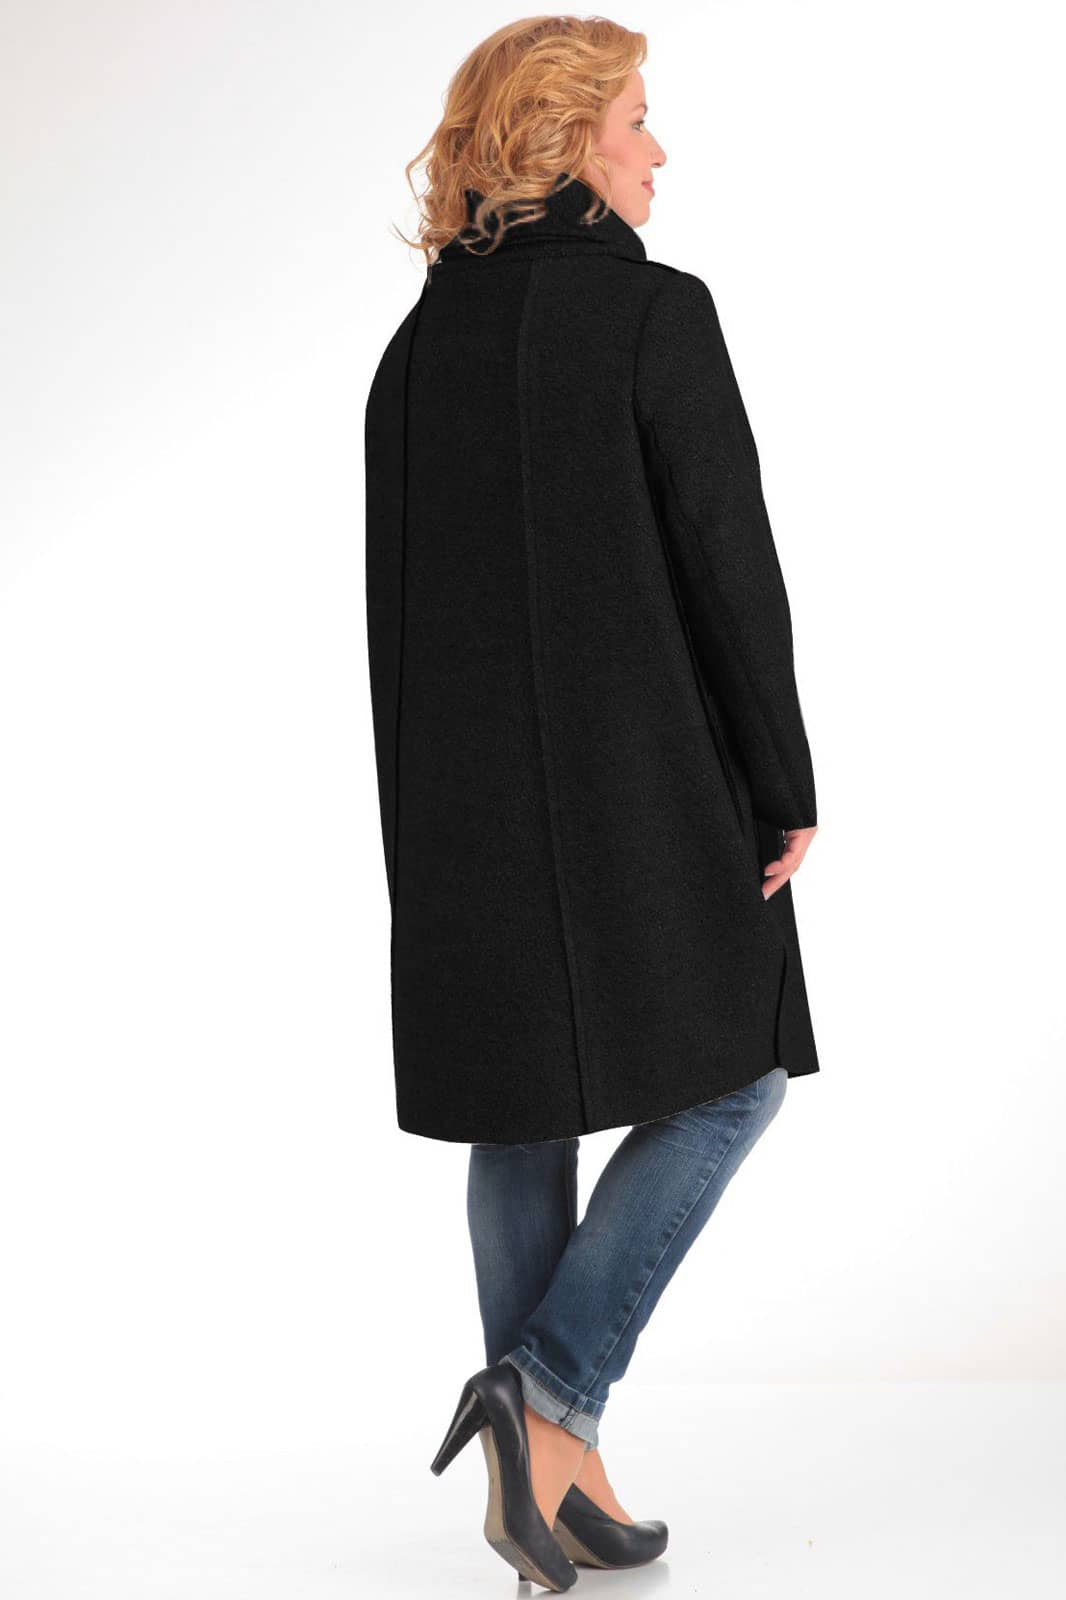 Пальто Pretty 485-2 черный - фото 2